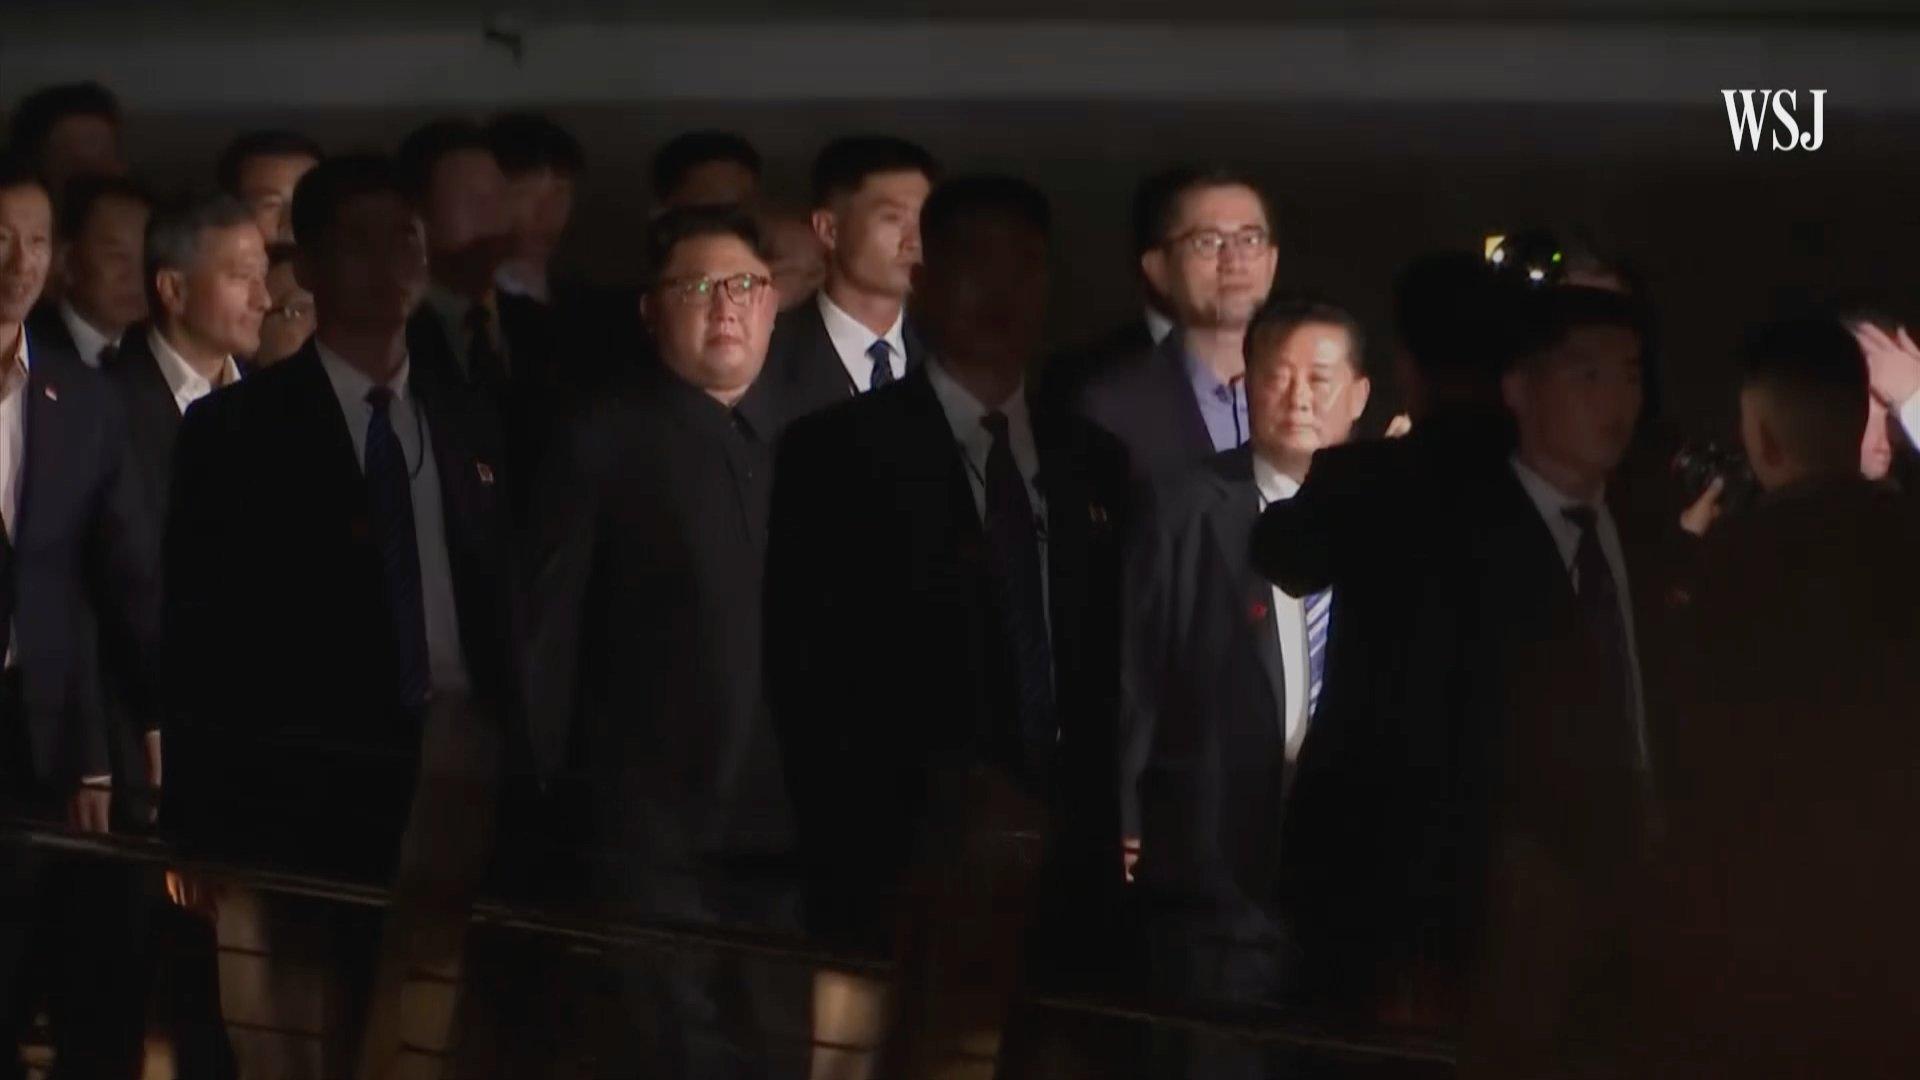 A sightseeing dictator? Kim Jong Un takes selfies in Singapore https://t.co/xZBU8JqEwd https://t.co/WFAUZY2MPf